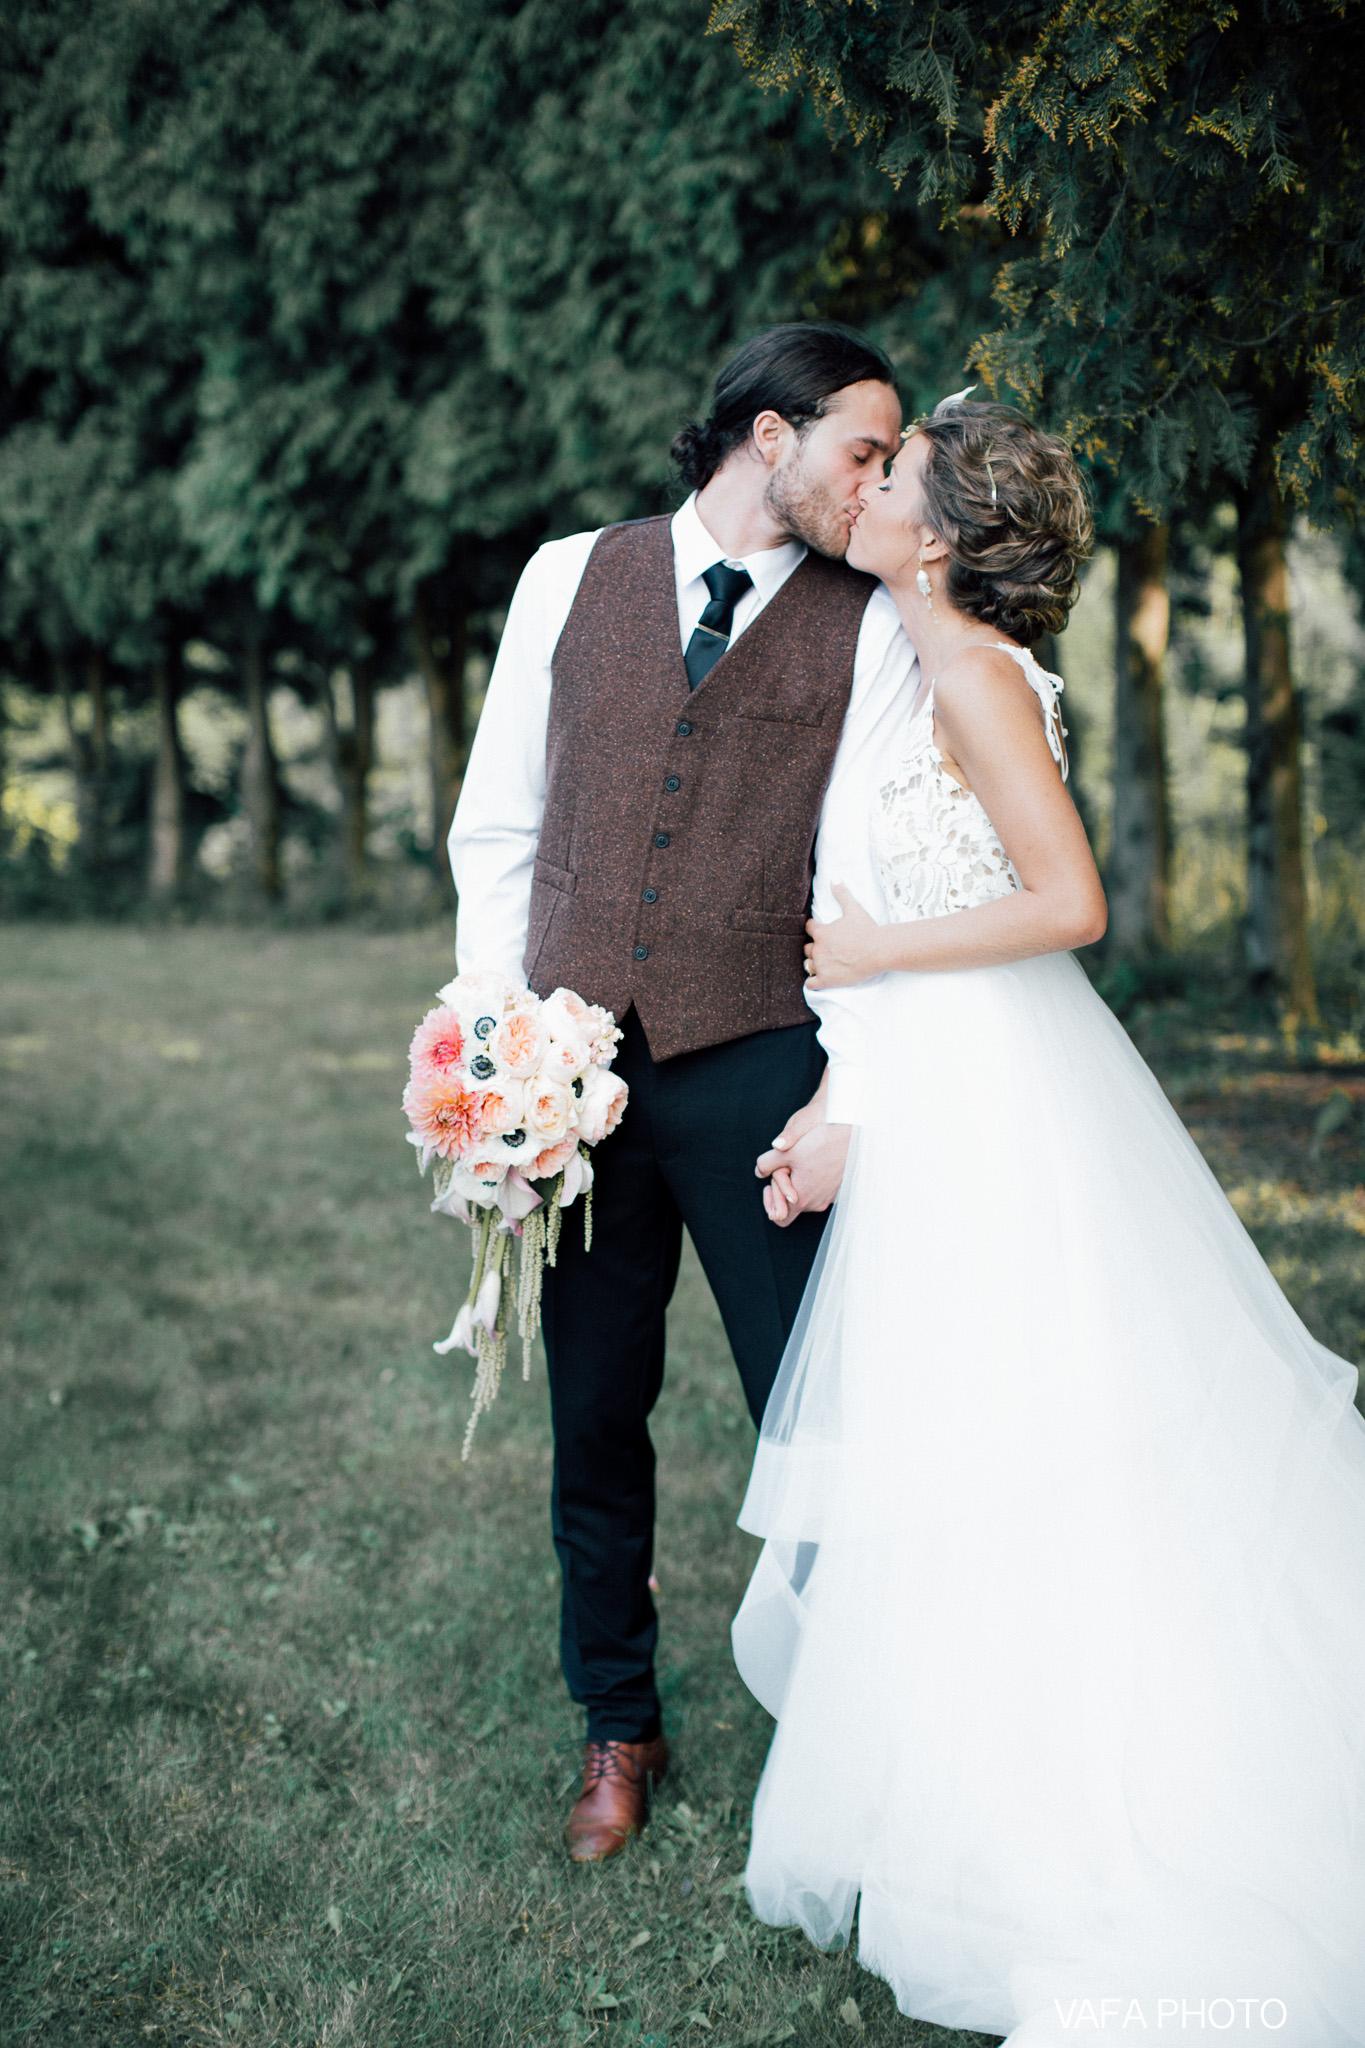 The-Felt-Estate-Wedding-Kailie-David-Vafa-Photo-681.jpg